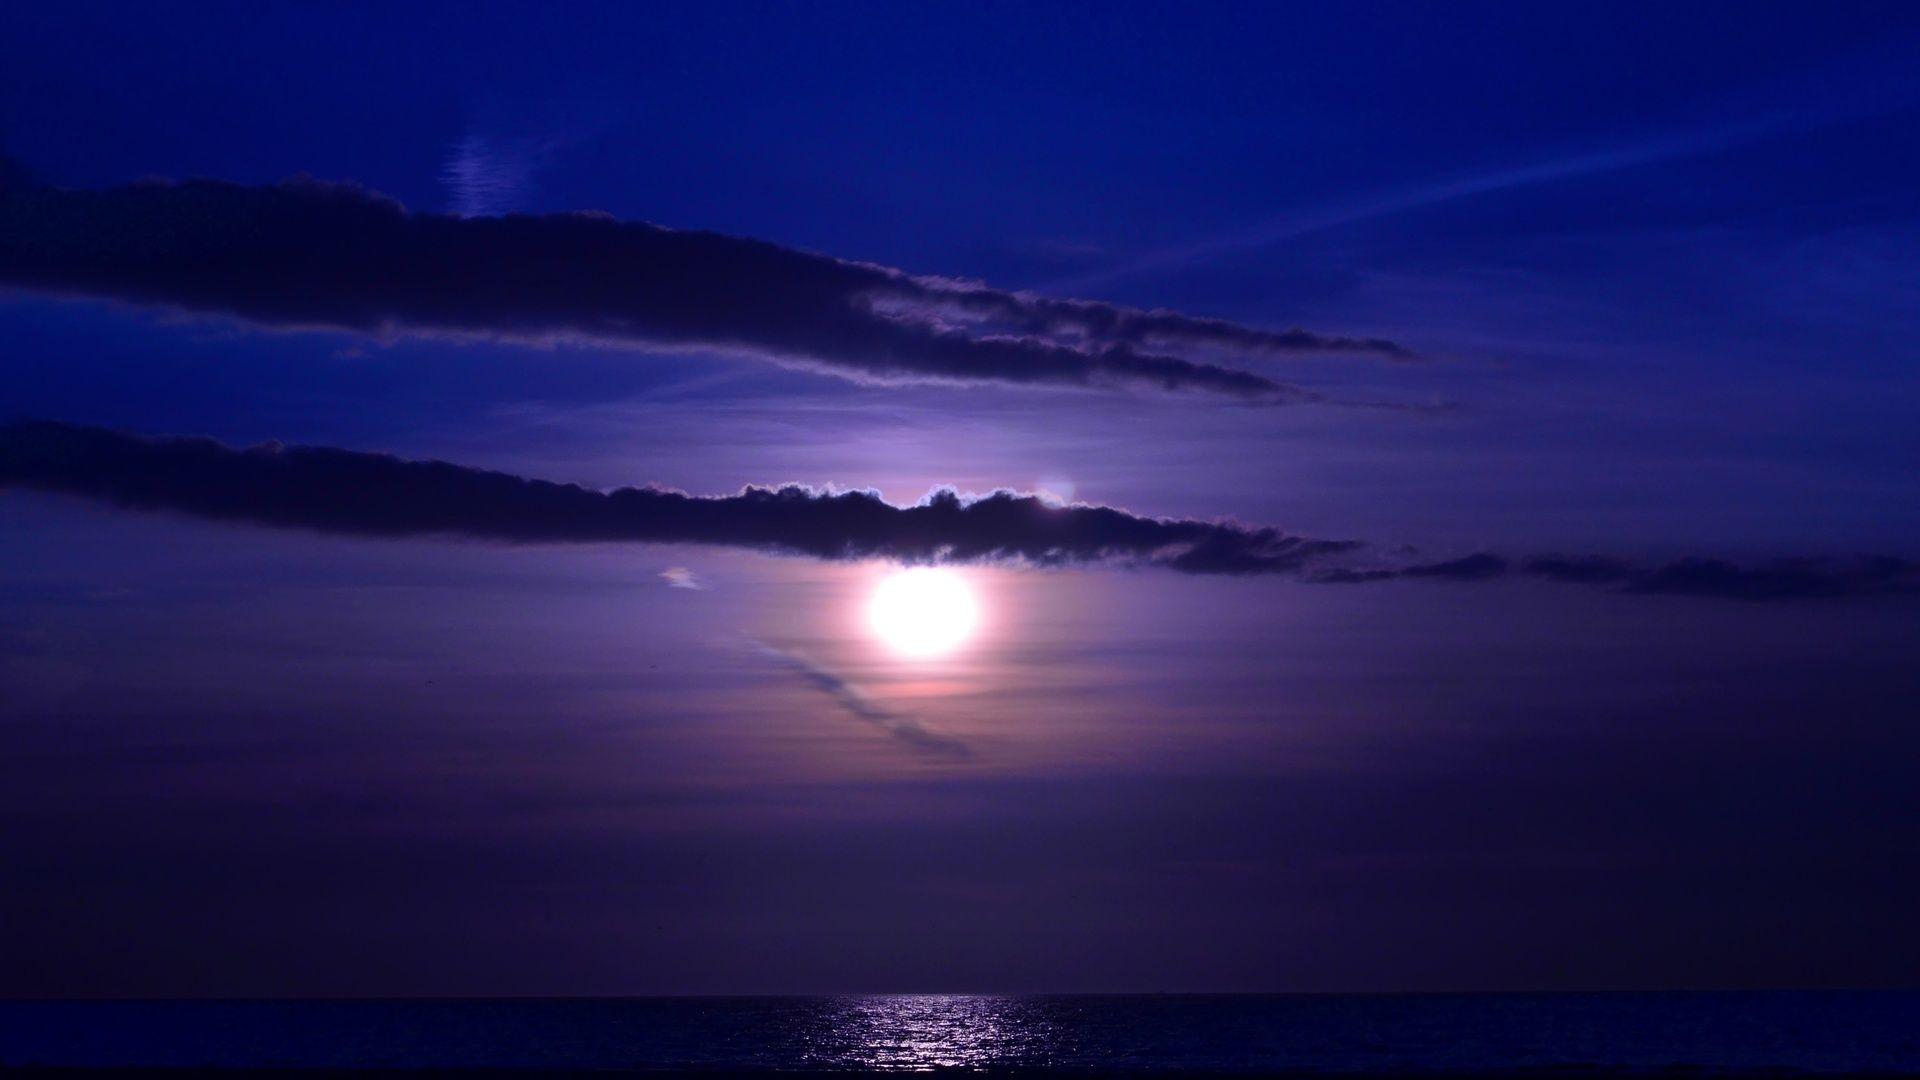 Amazing Ocean Night Nature HD Wallpaper 1920x1080